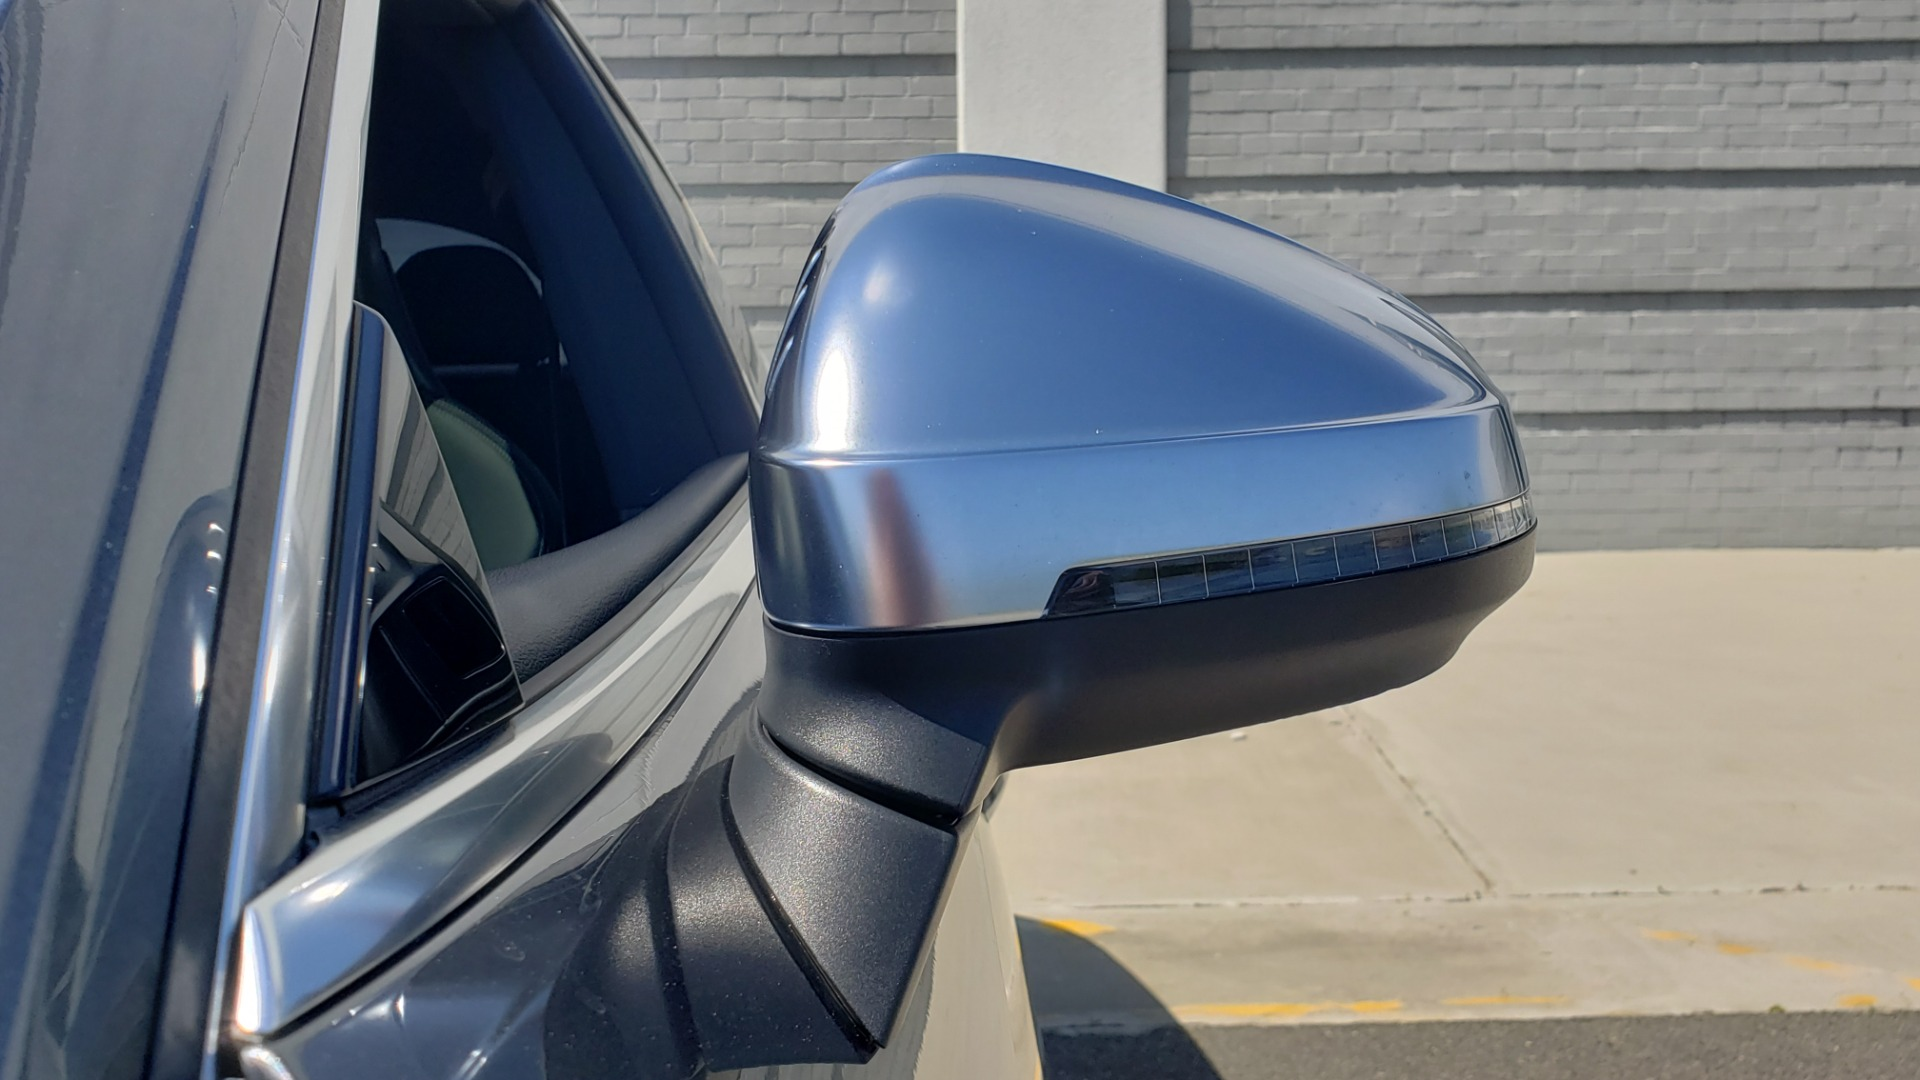 Used 2018 Audi S5 SPORTBACK PRESTIGE S-SPORT / NAV / SUNROOF / HUD / B&O SND / REARVIEW for sale $48,995 at Formula Imports in Charlotte NC 28227 26